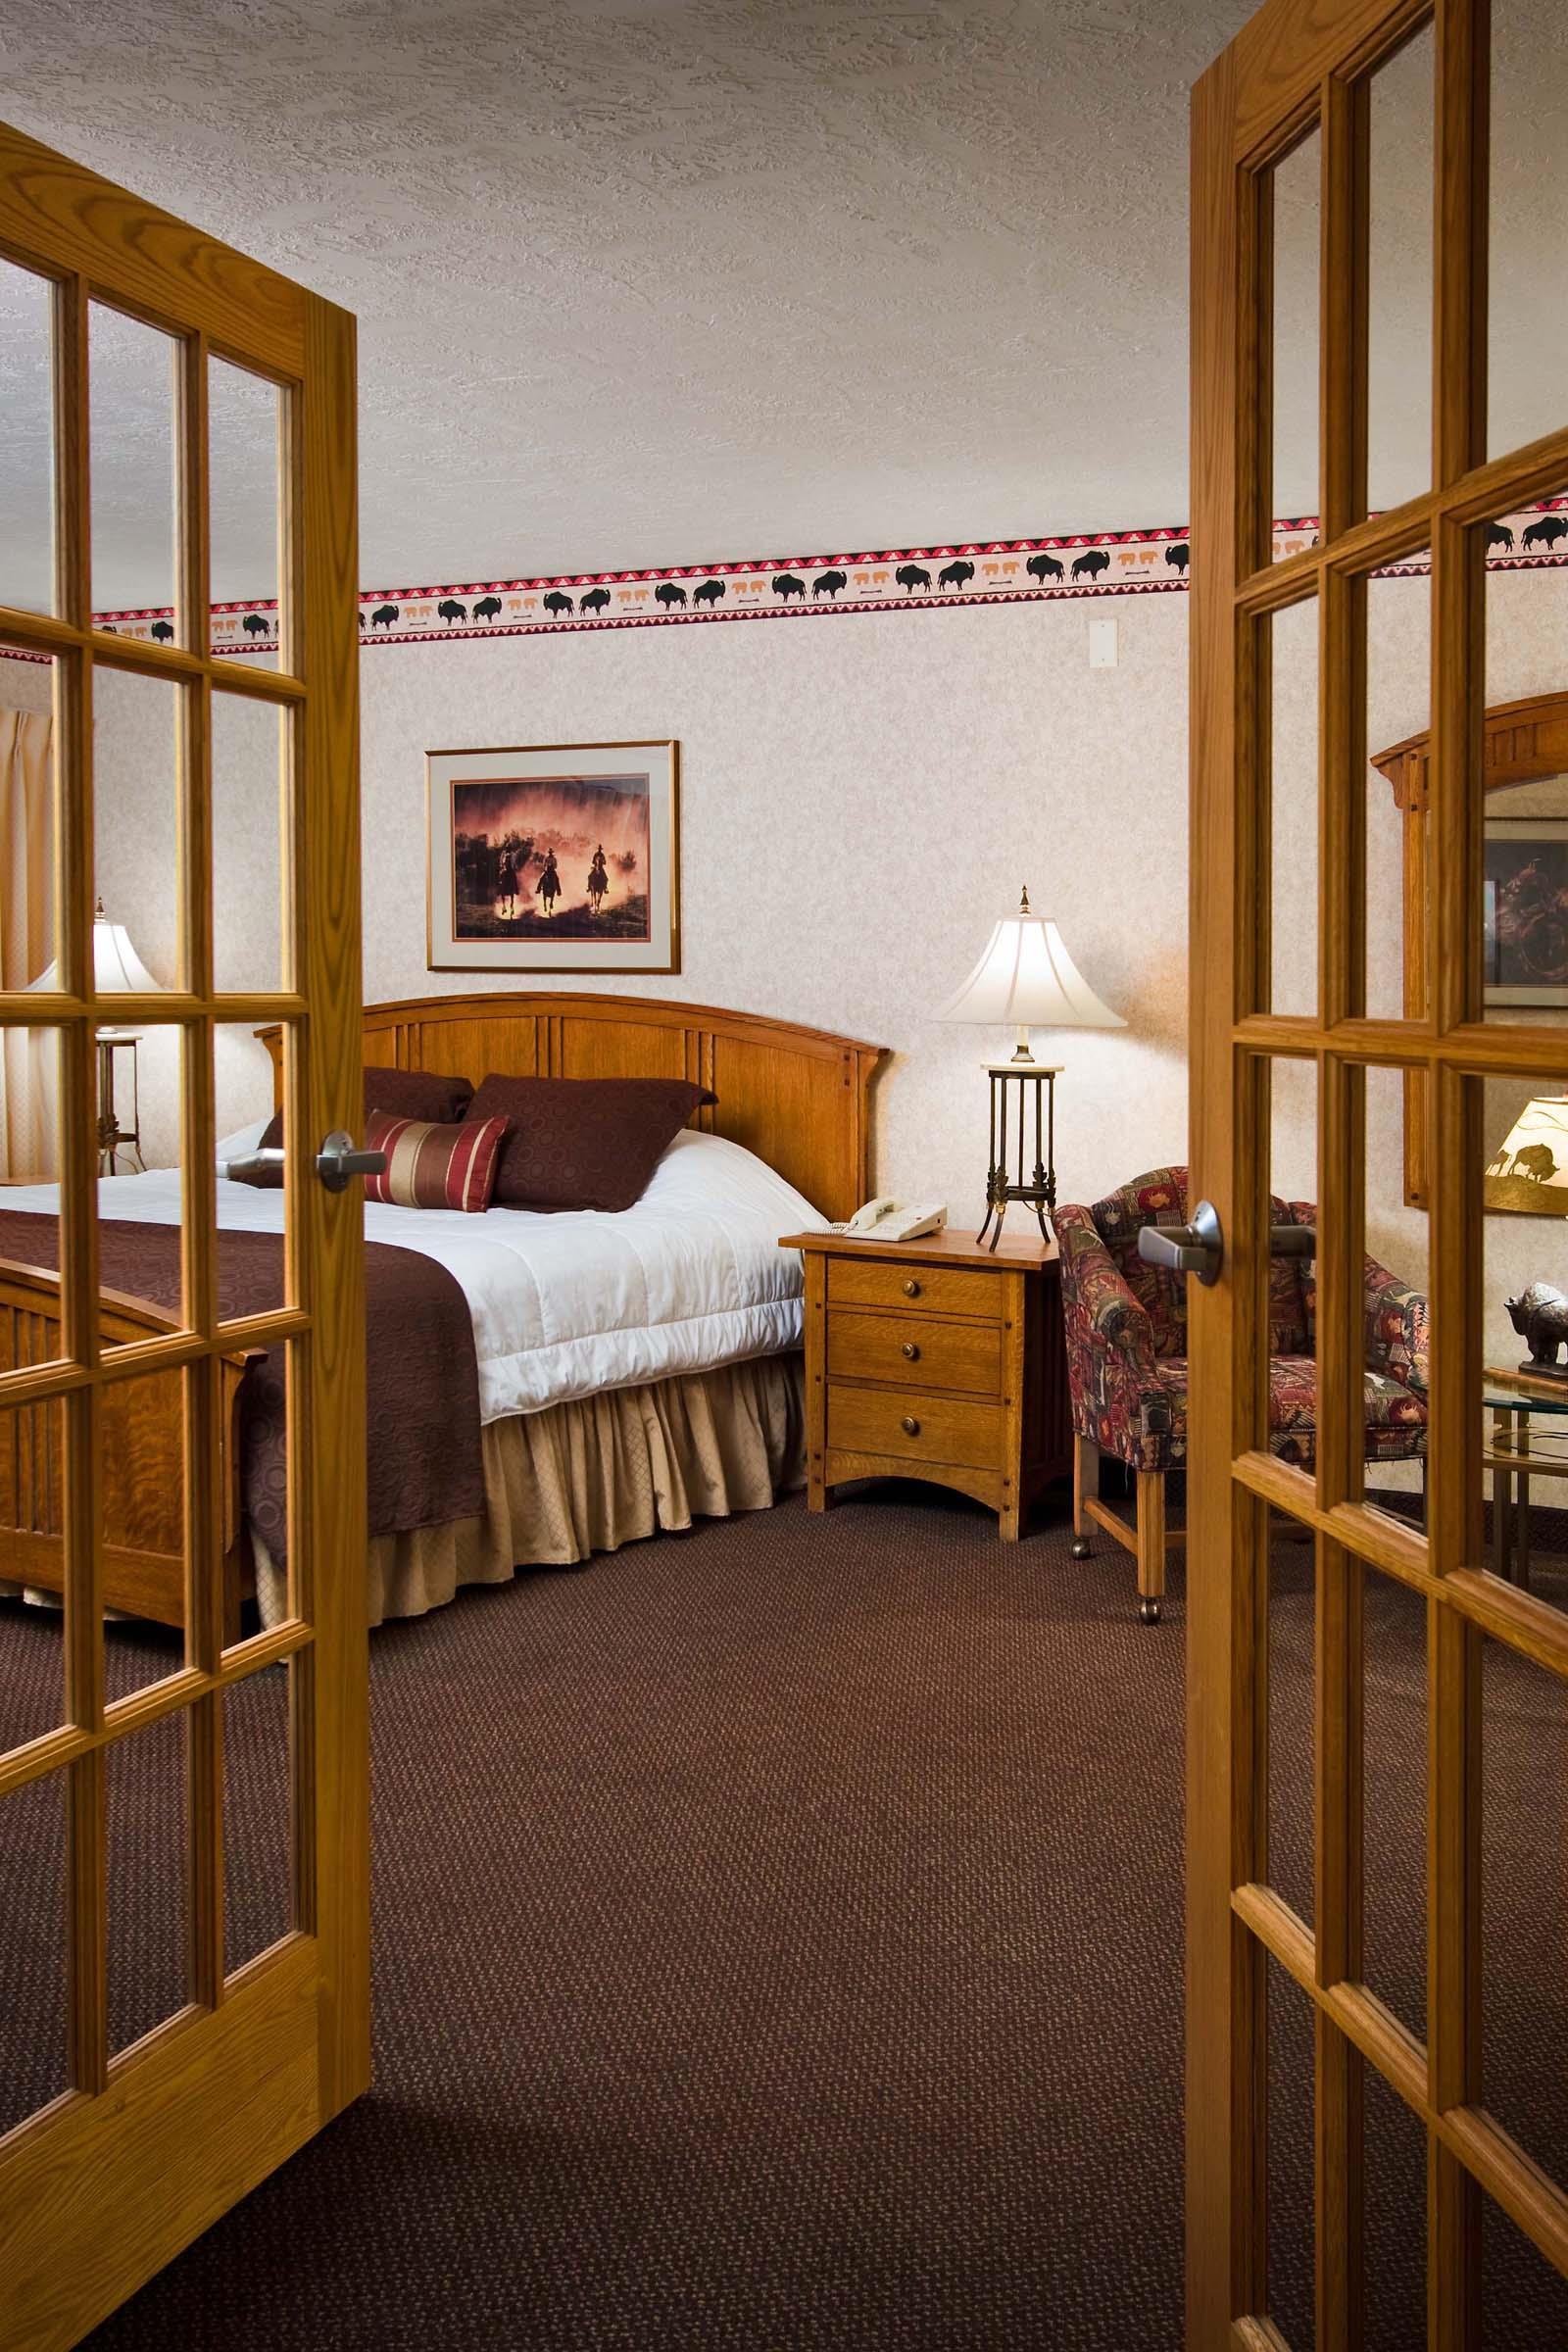 Best Western Ramkota Hotel image 17